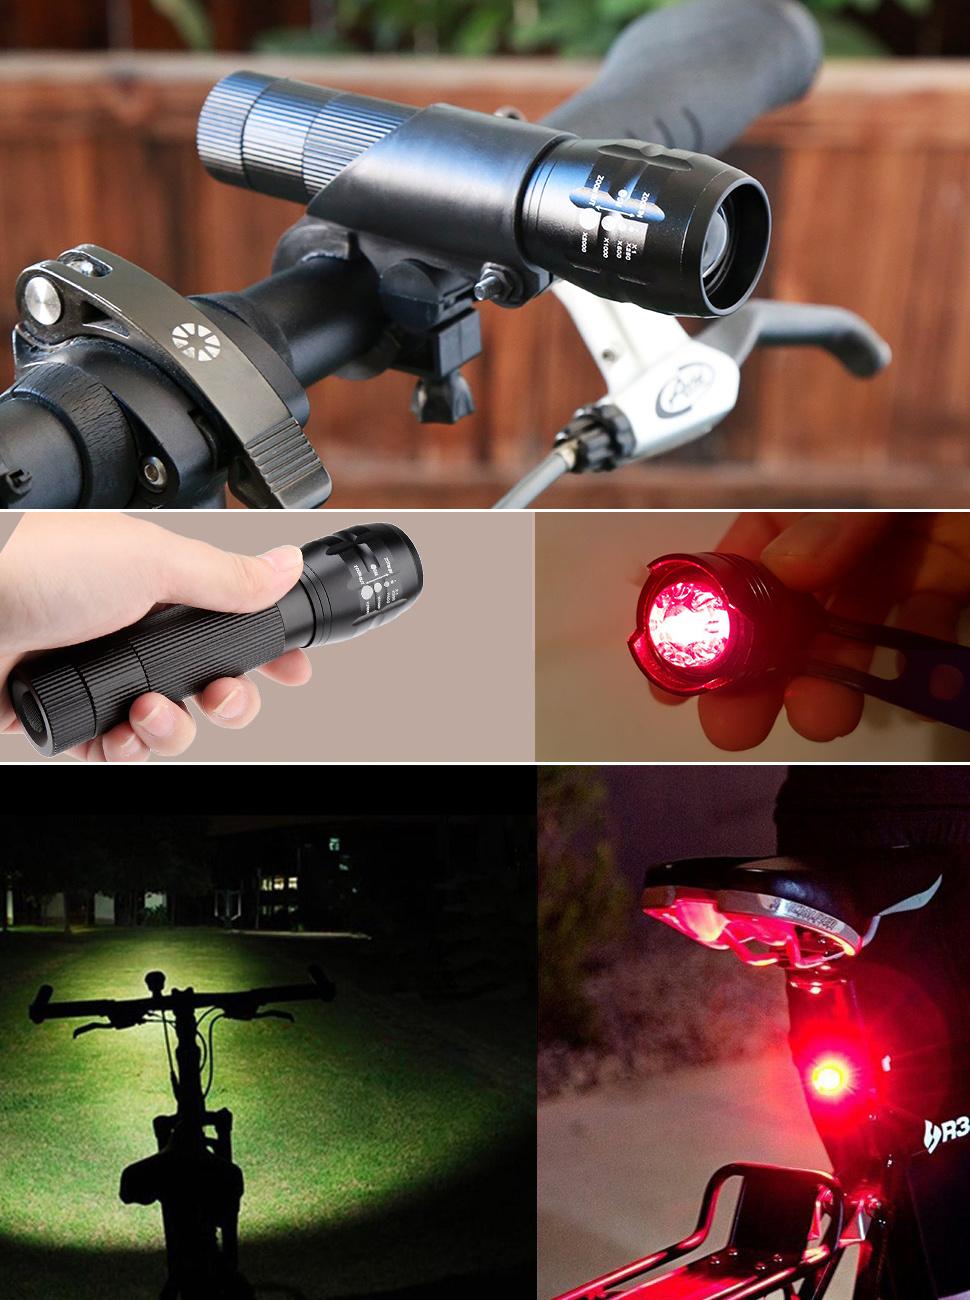 Blusmart Bicycle Headlight Taillight - Super Bright LED Bicycle Light Set, 600 Lumen Waterproof Zoomable Headlight, 2 Taillight, Bike Light Set